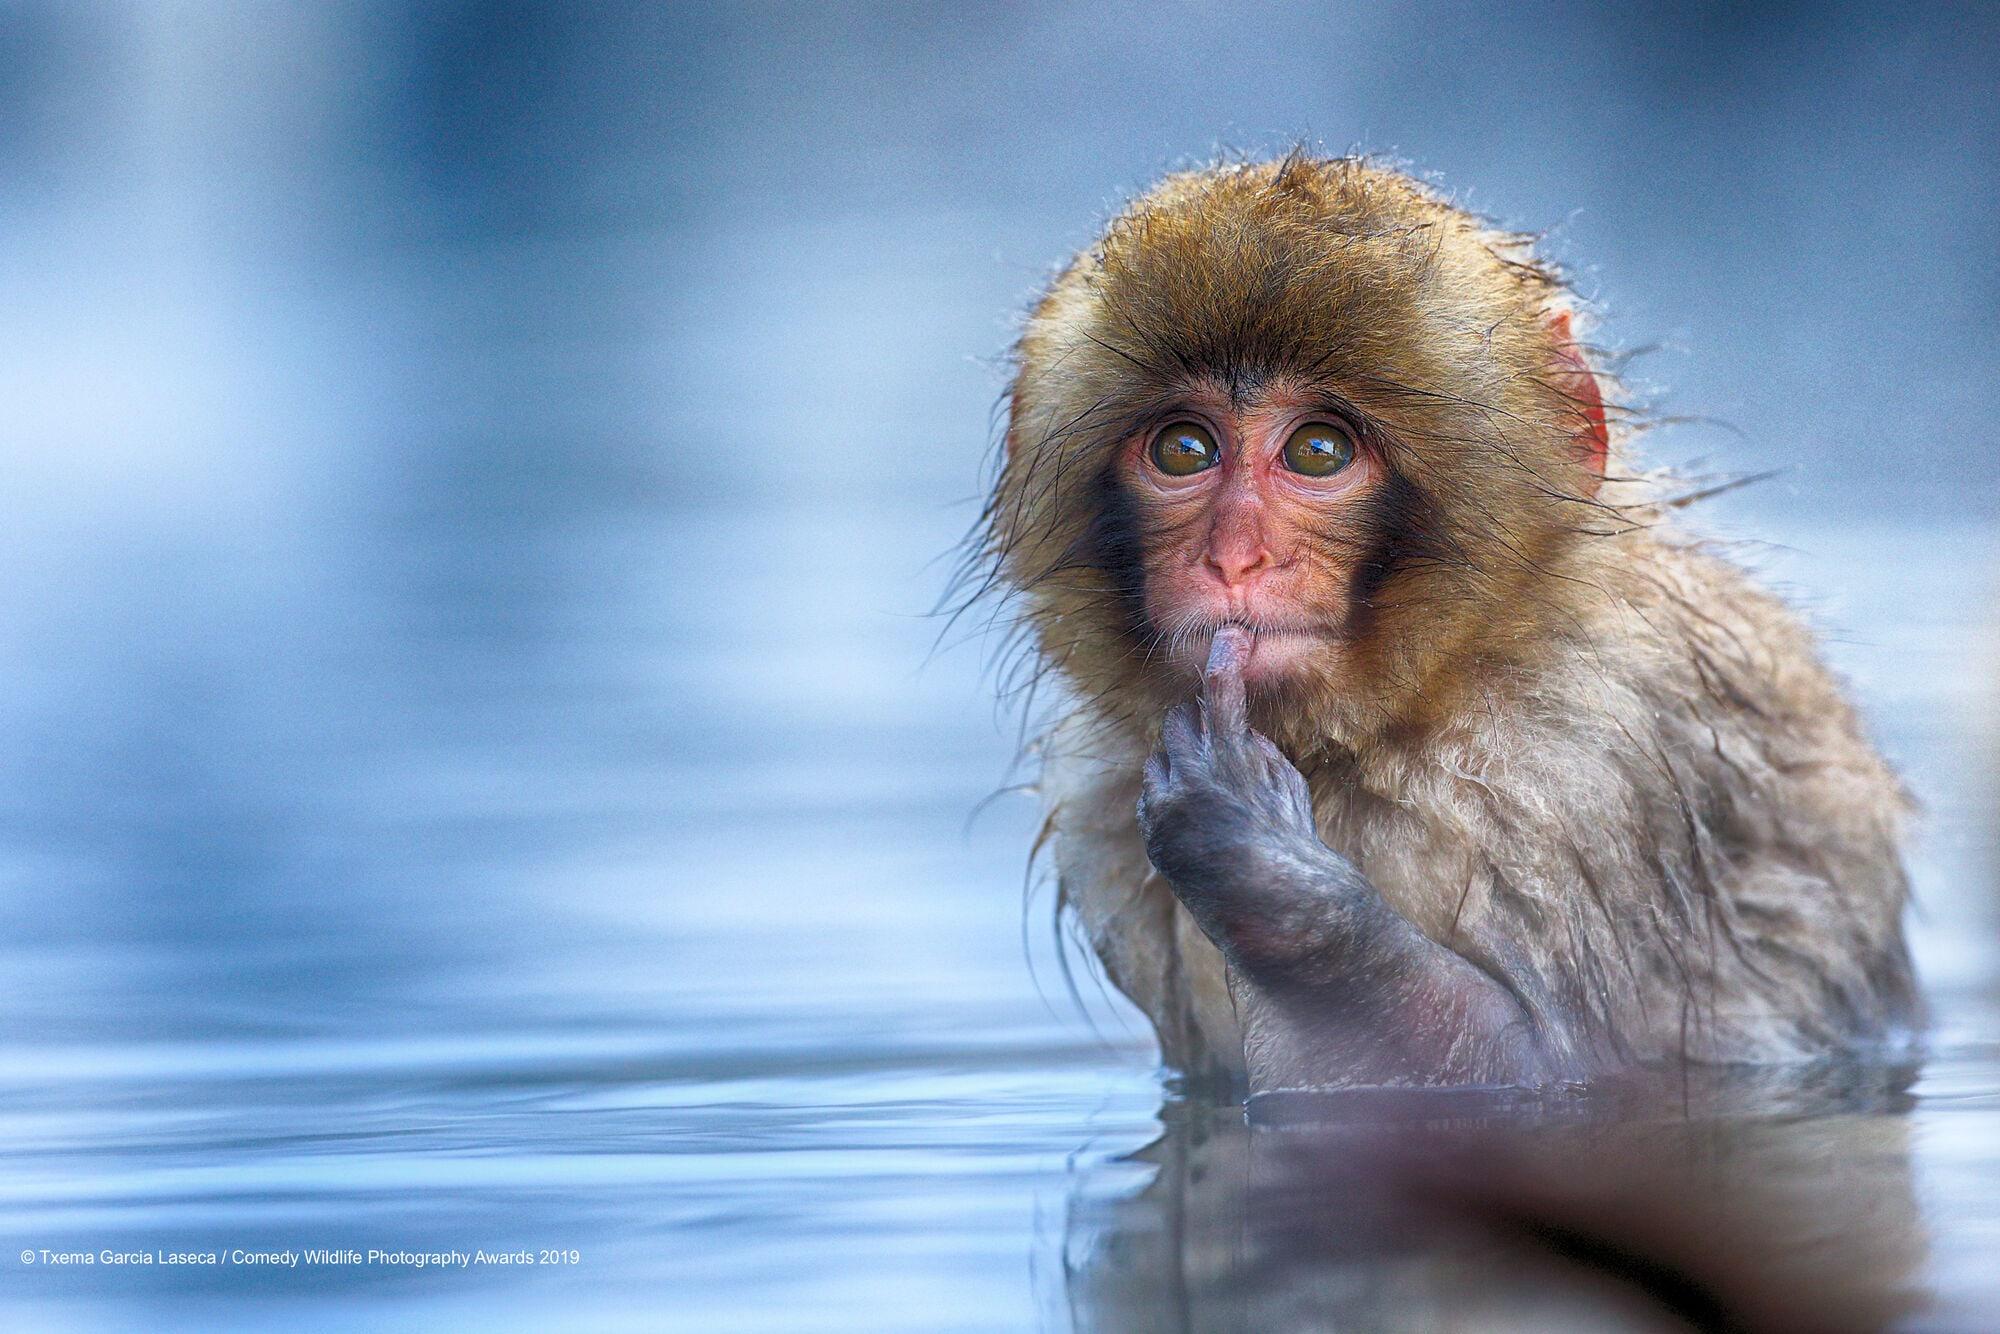 comedy wildlife photography 8